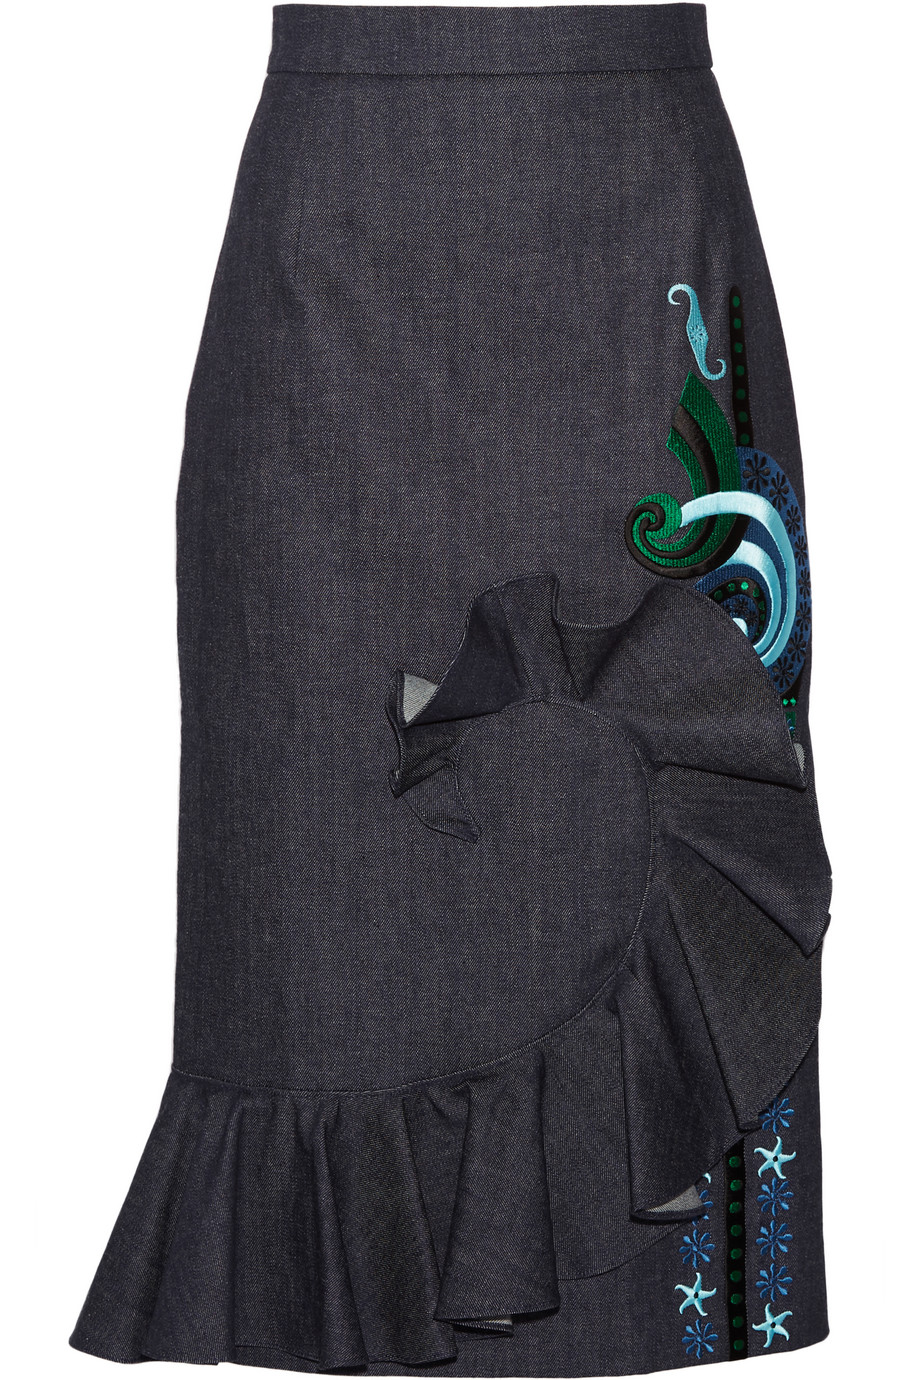 Holly Fulton Ruffled Embroidered Denim Midi Skirt, Dark Denim, Women's, Size: 10